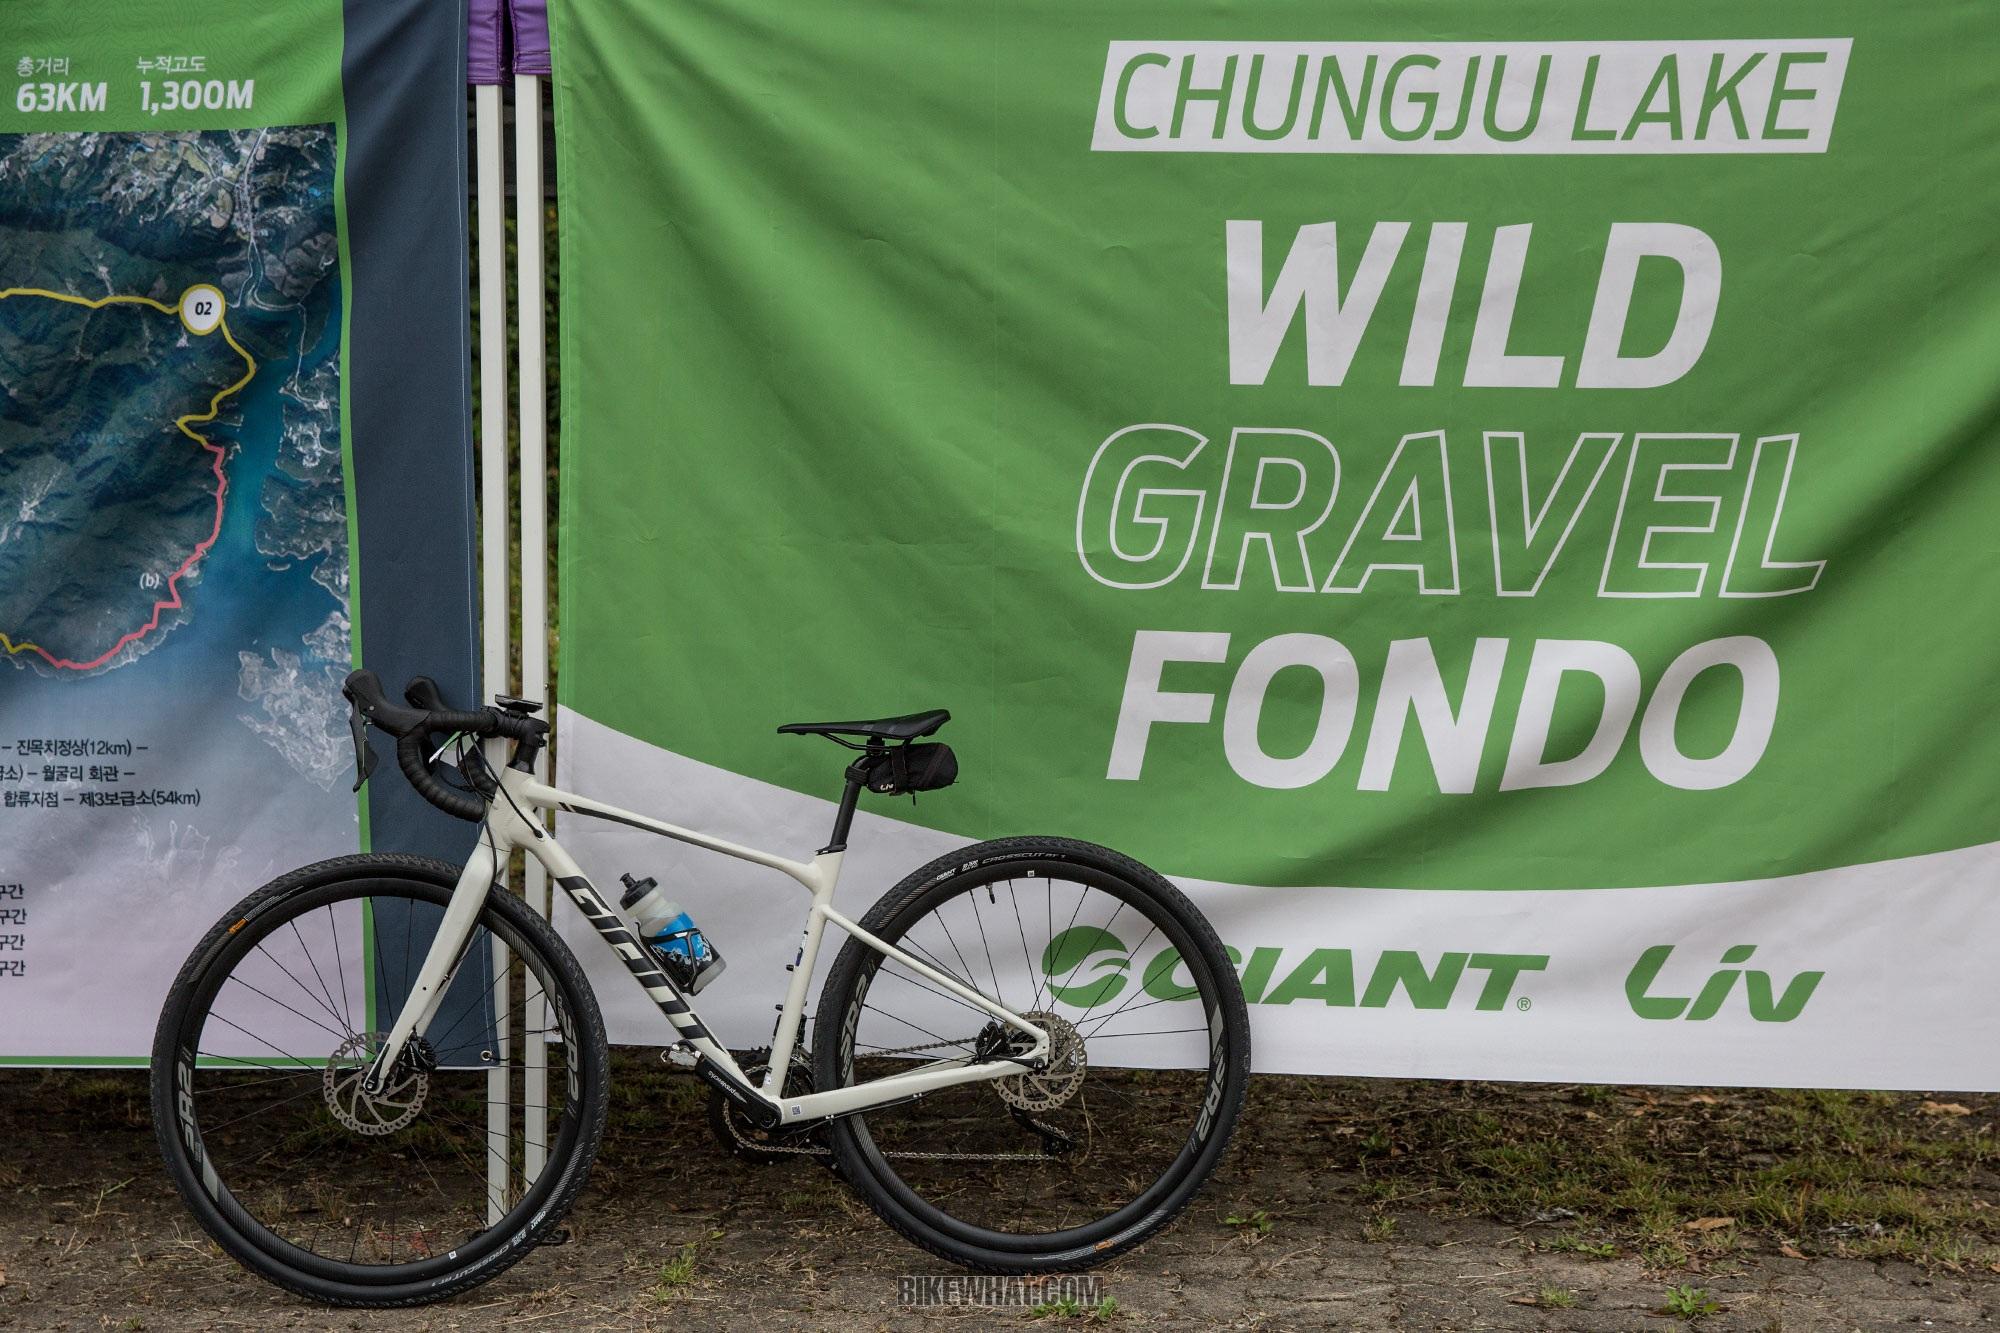 event_Wild_Gravel_Fondo_1.jpg